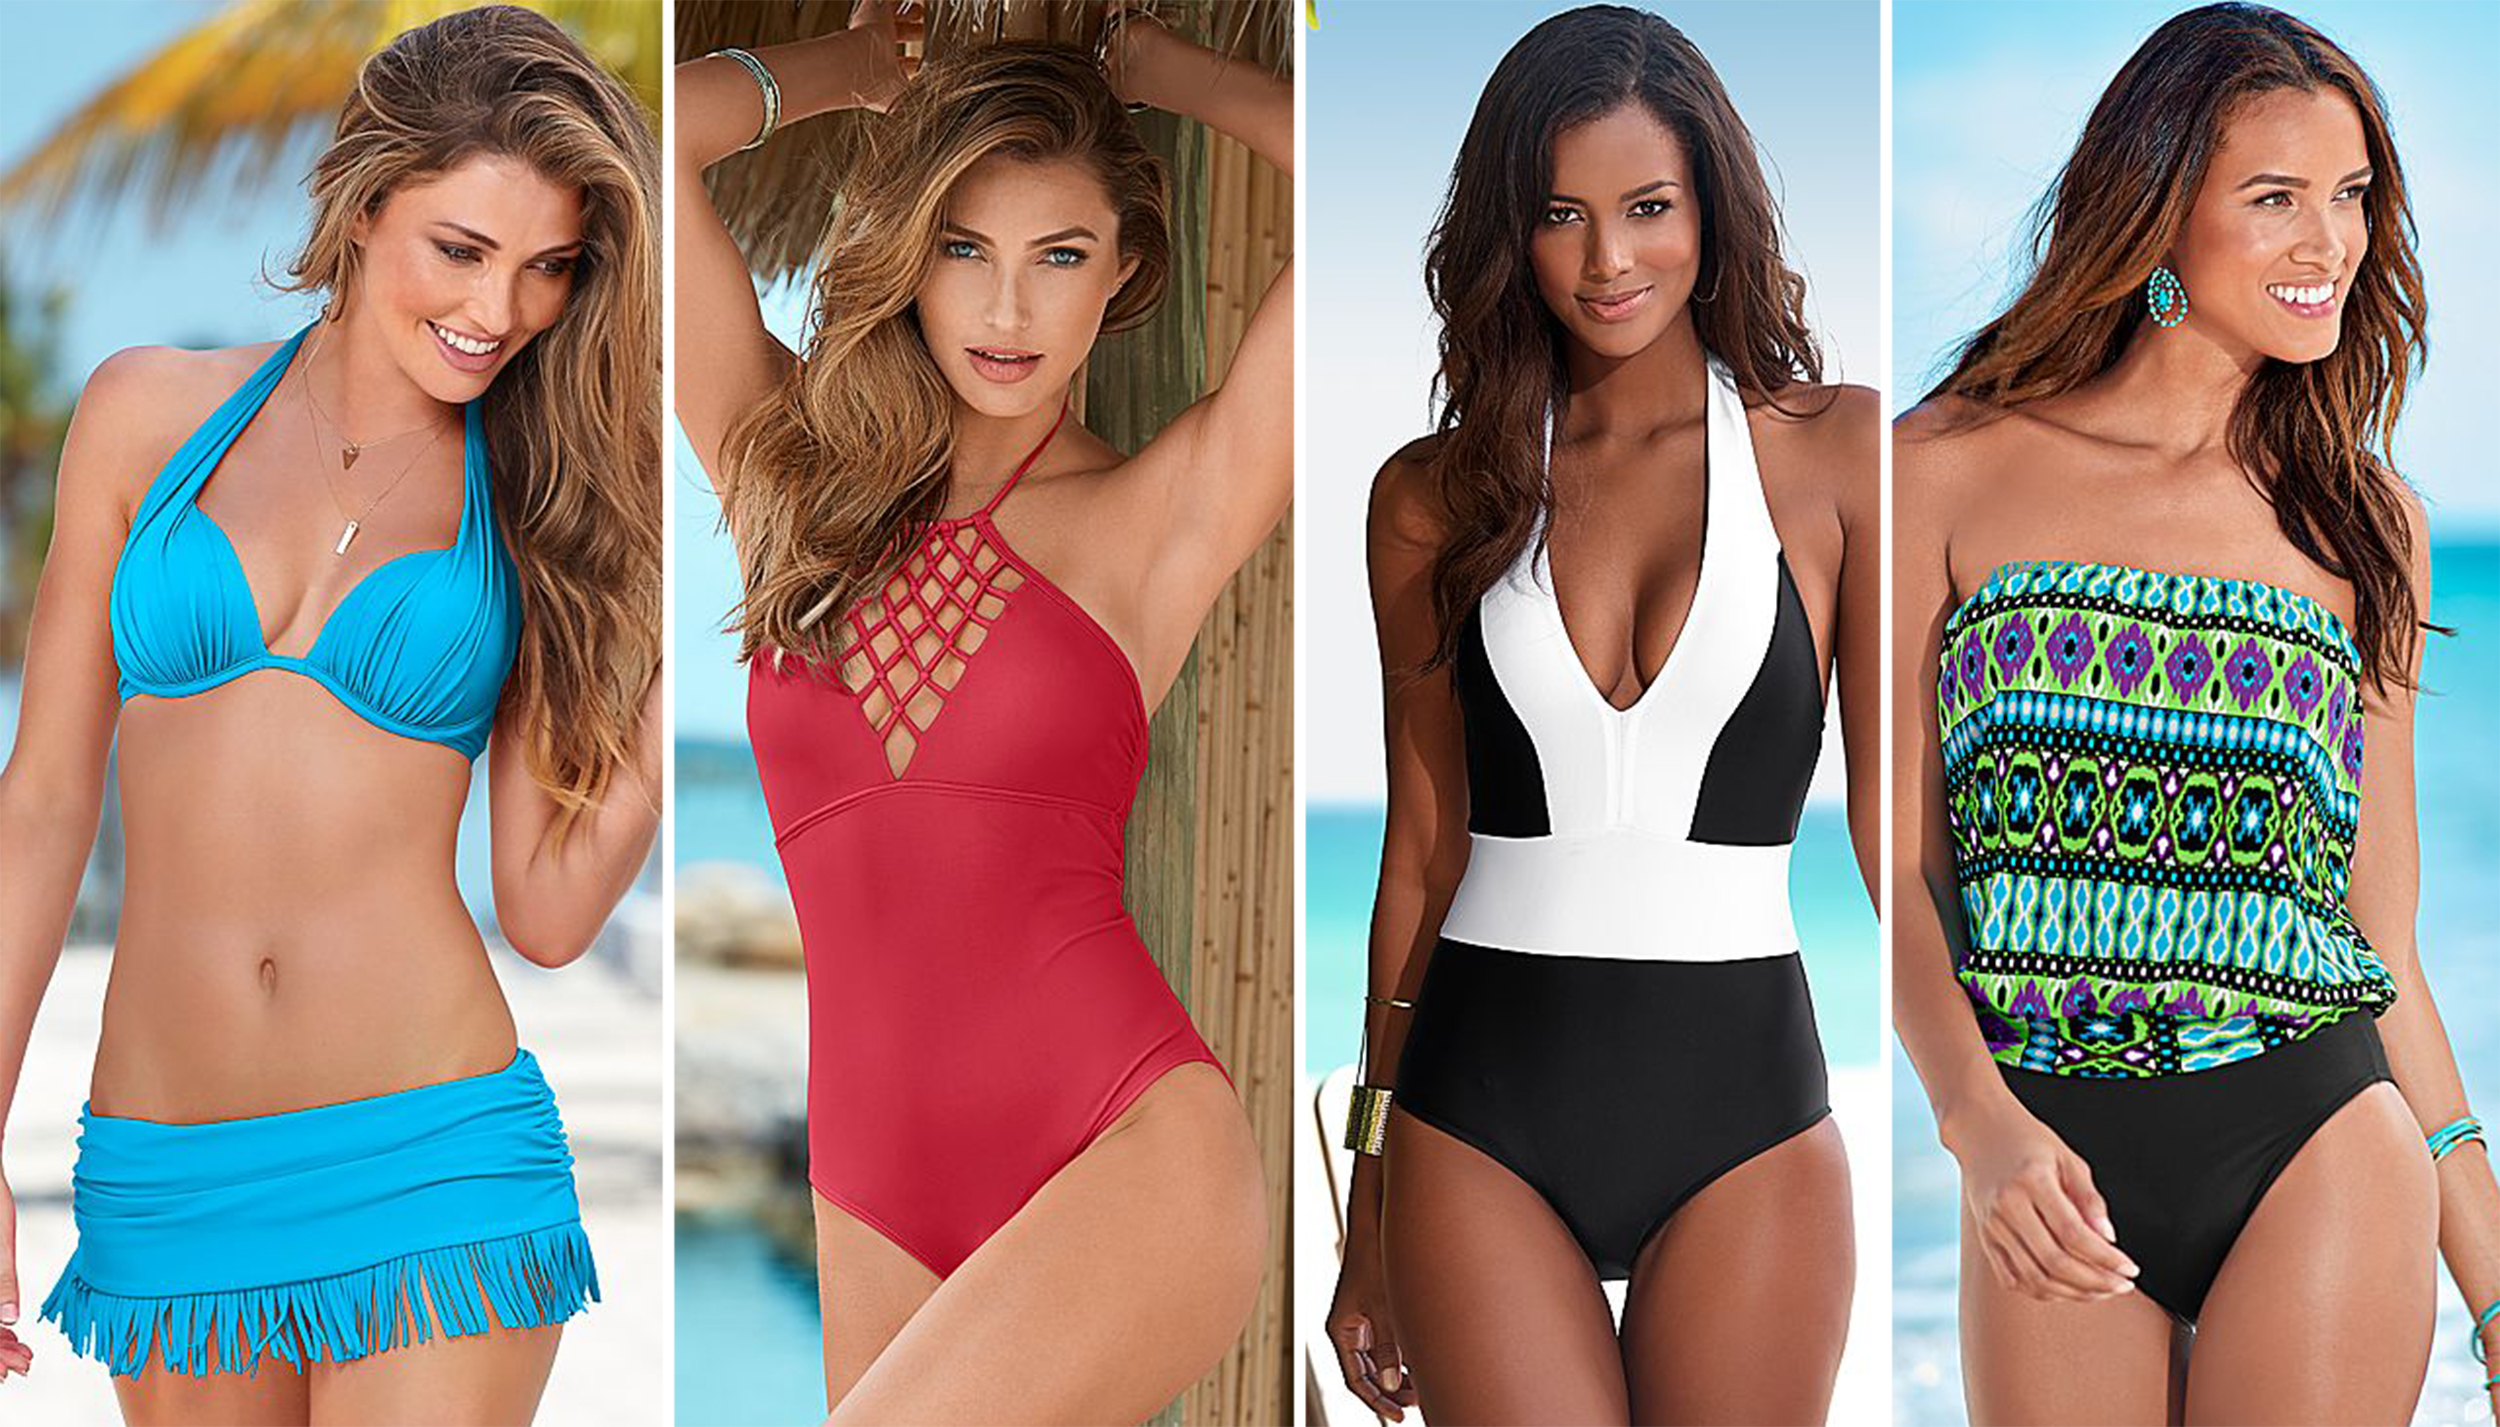 swimsuits-online-today-160421-venus-tease_029a9738551f0a8ff1ff09fa4f34b90a.jpg